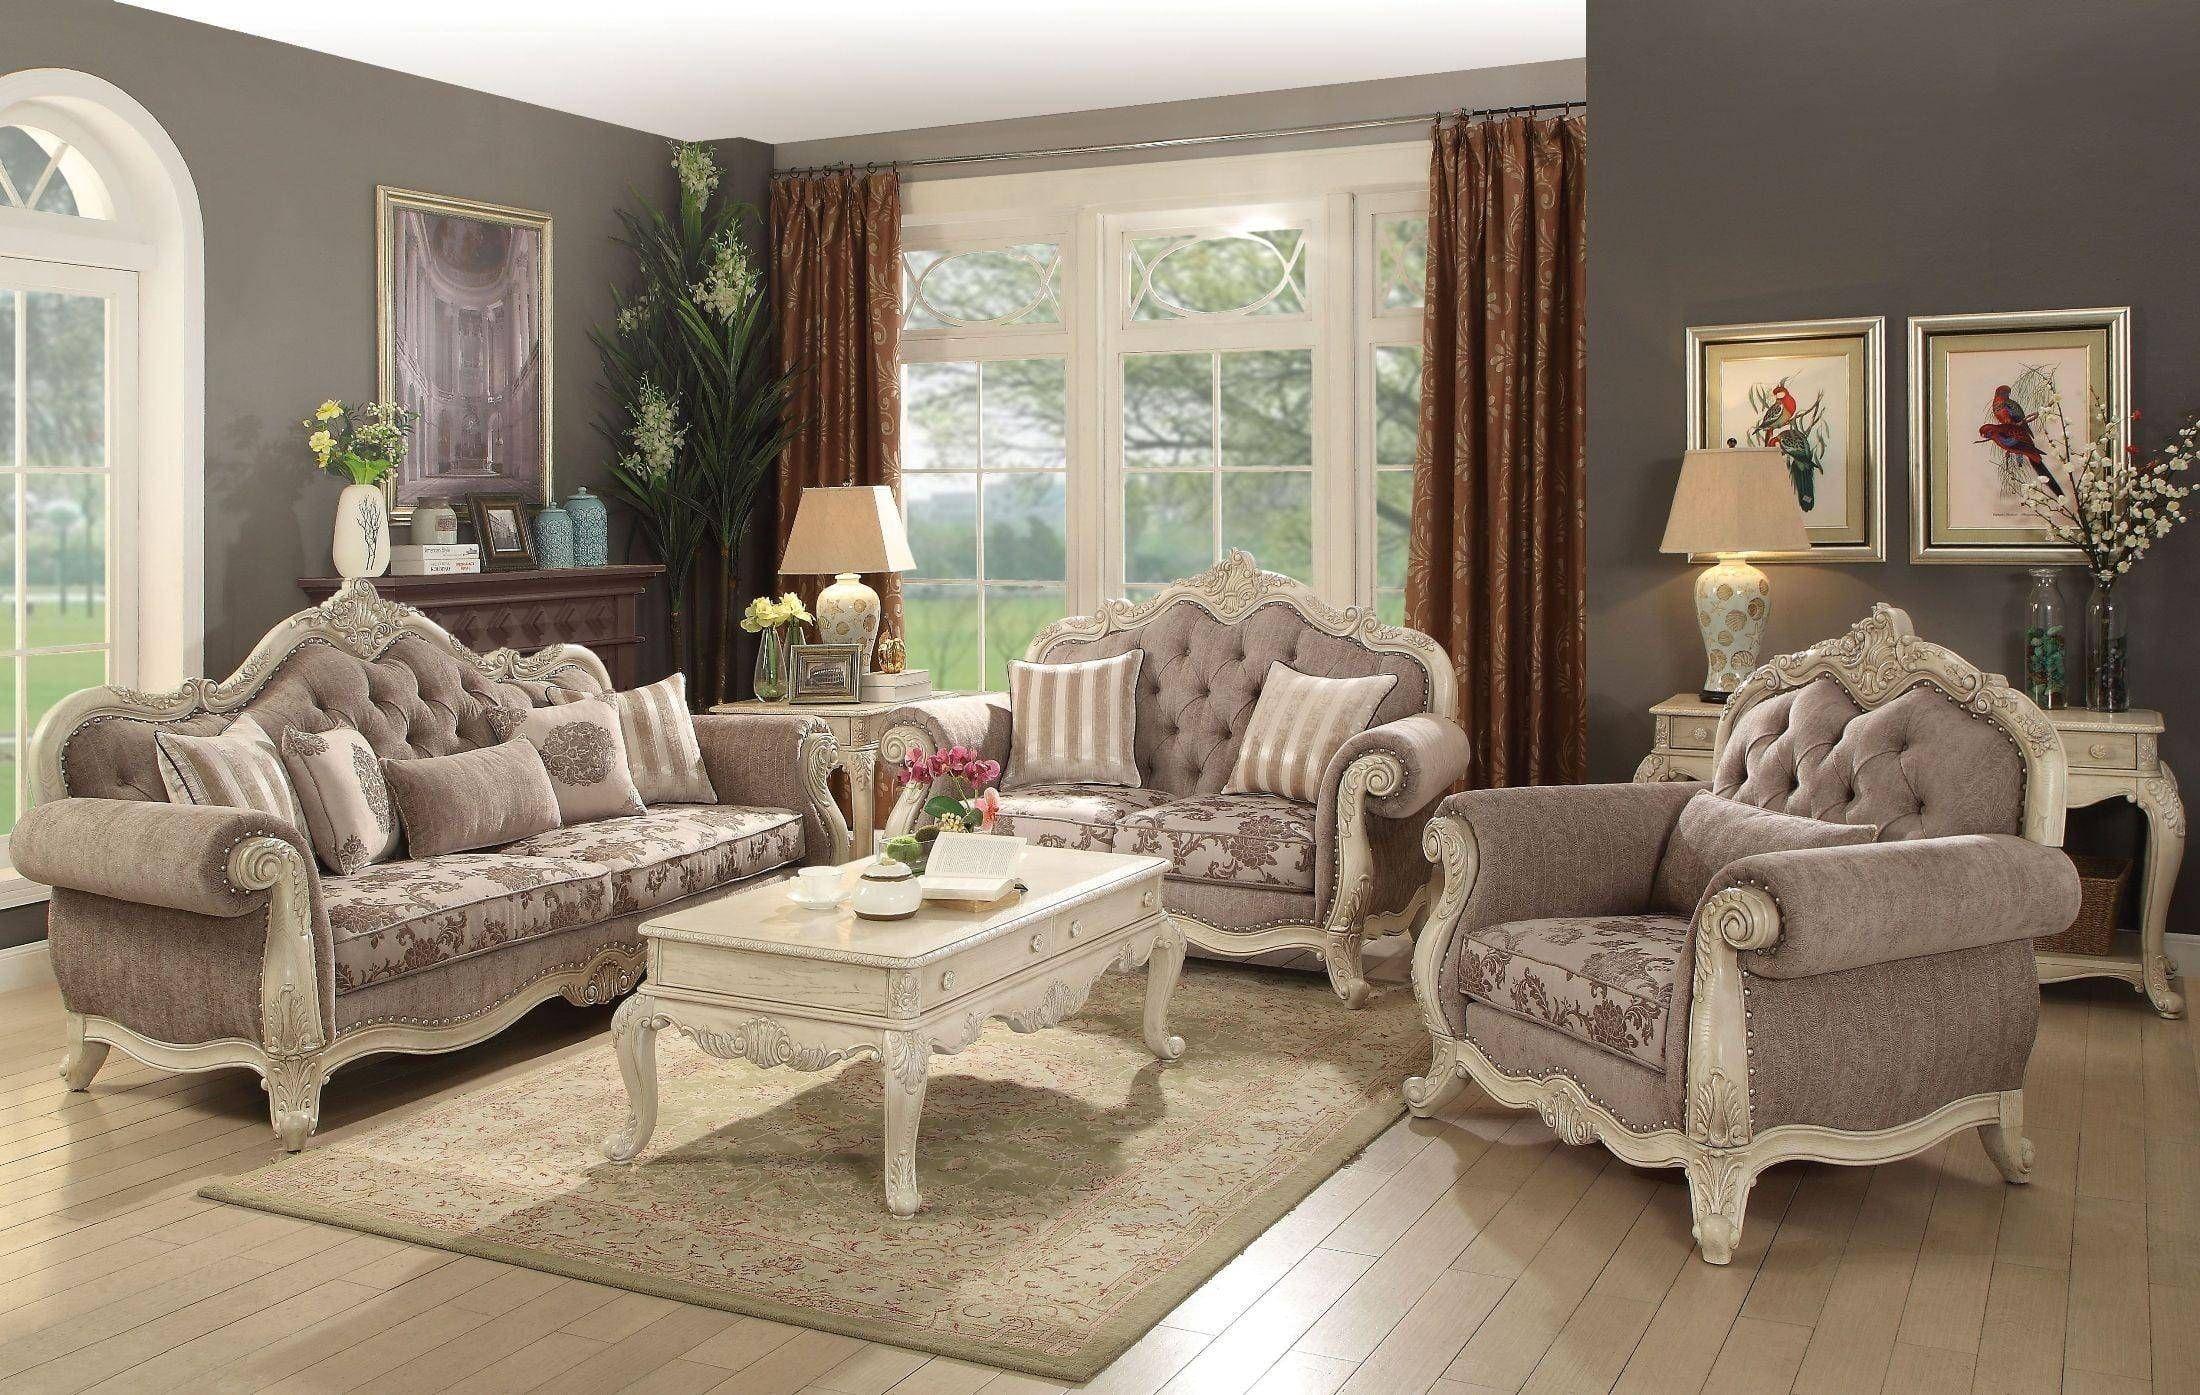 13 Smart Tricks Of How To Build Antique Living Room Set Room Furniture Design Grey Sofa Living Room White Furniture Living Room